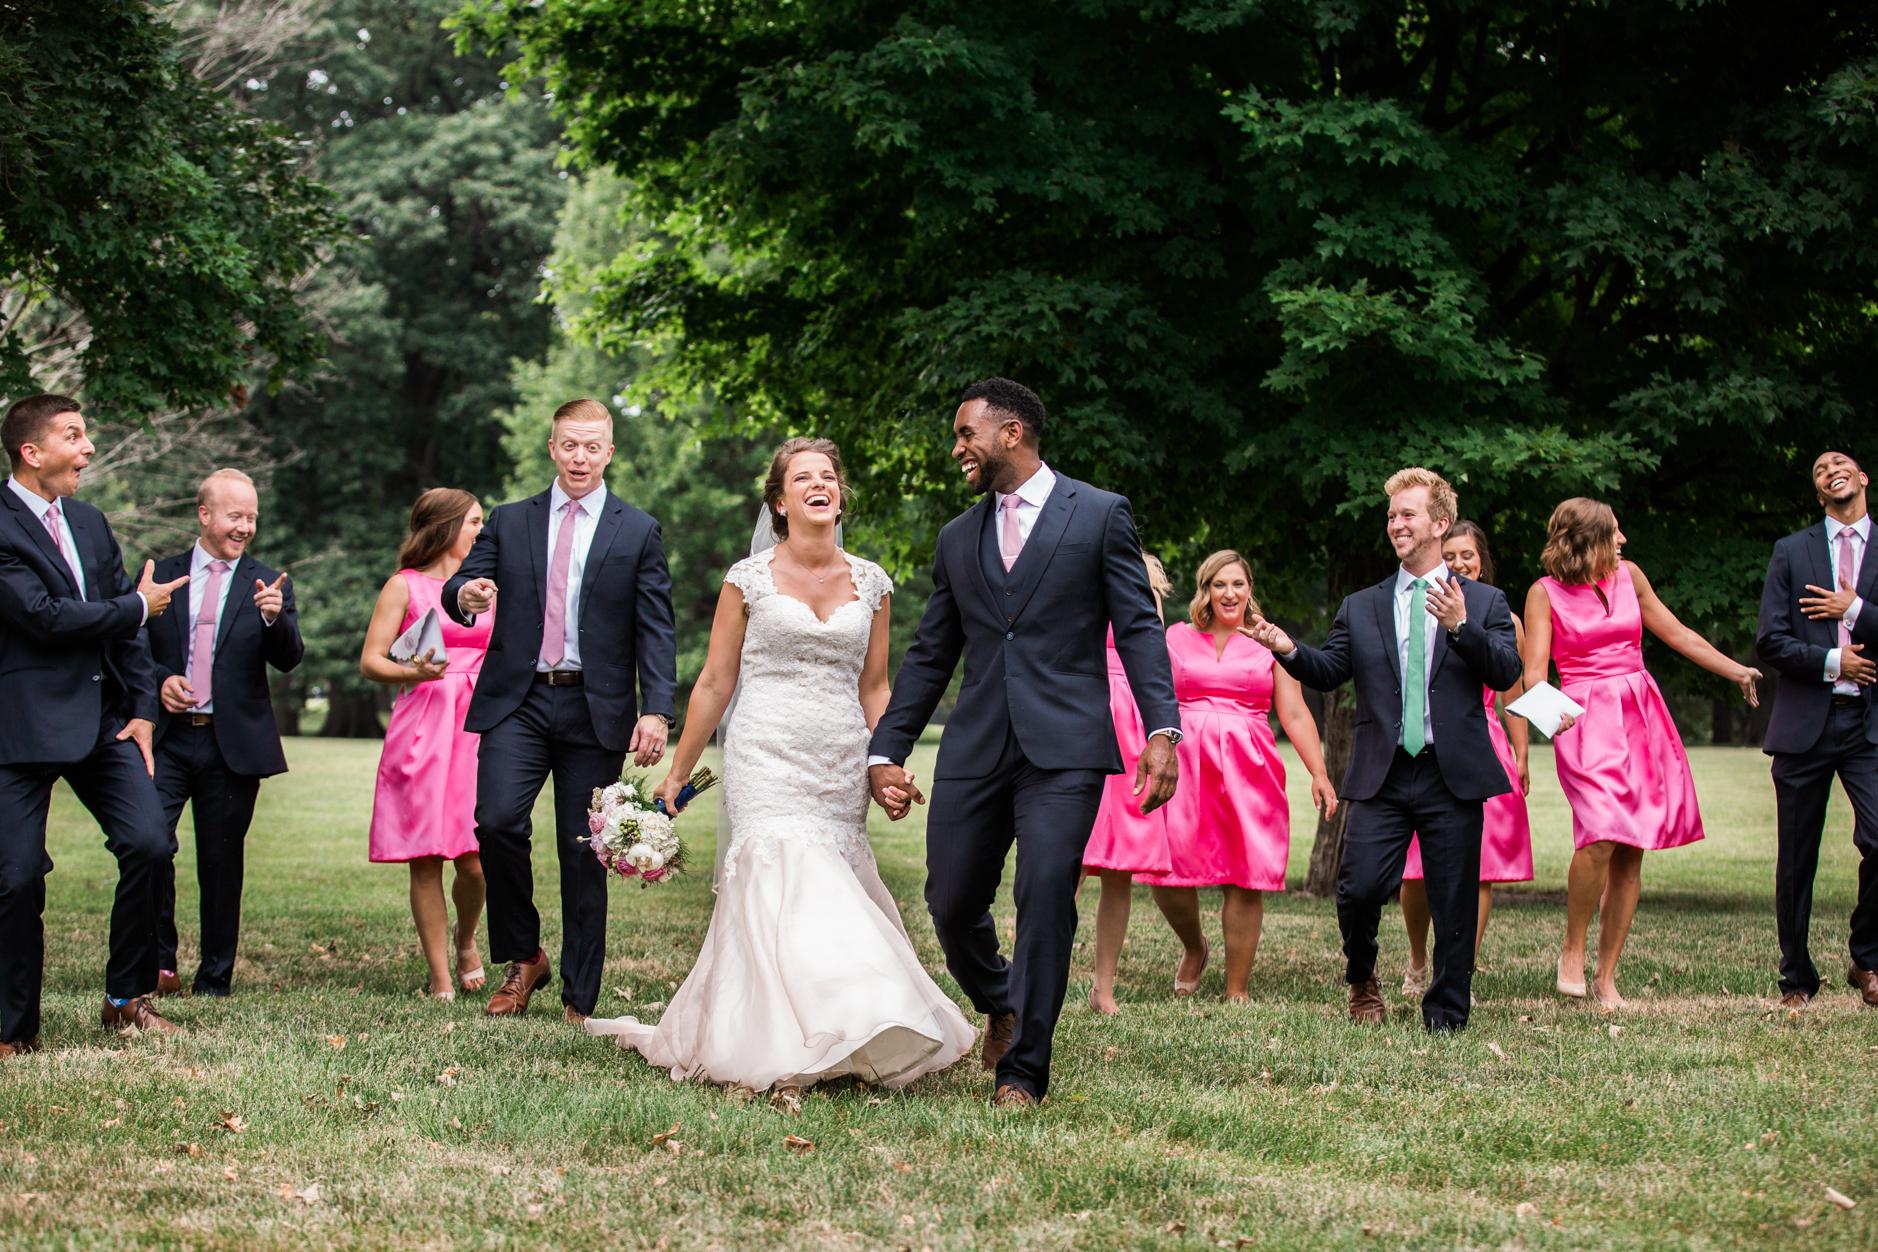 LegacyUnion-Wedding-Photographer-Glendale-CA-43.jpg